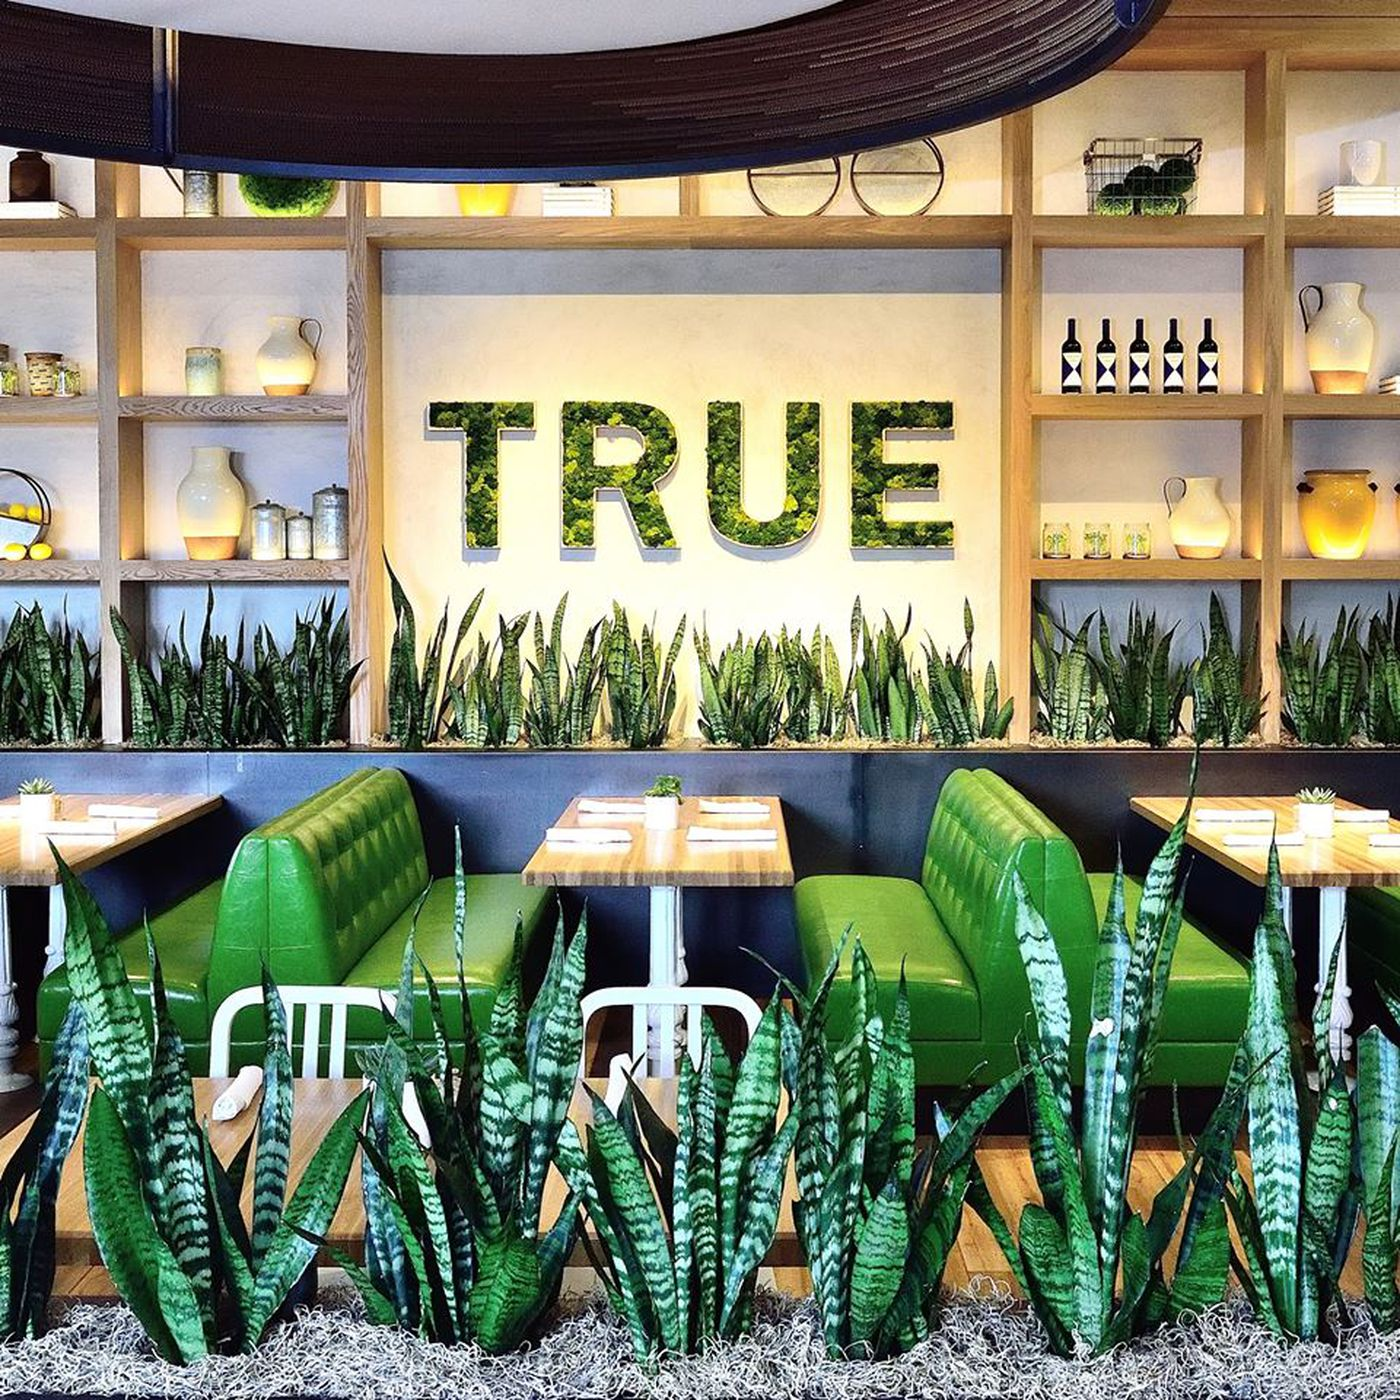 True Food Kitchen Plans To Open Two Las Vegas Locations Eater Vegas